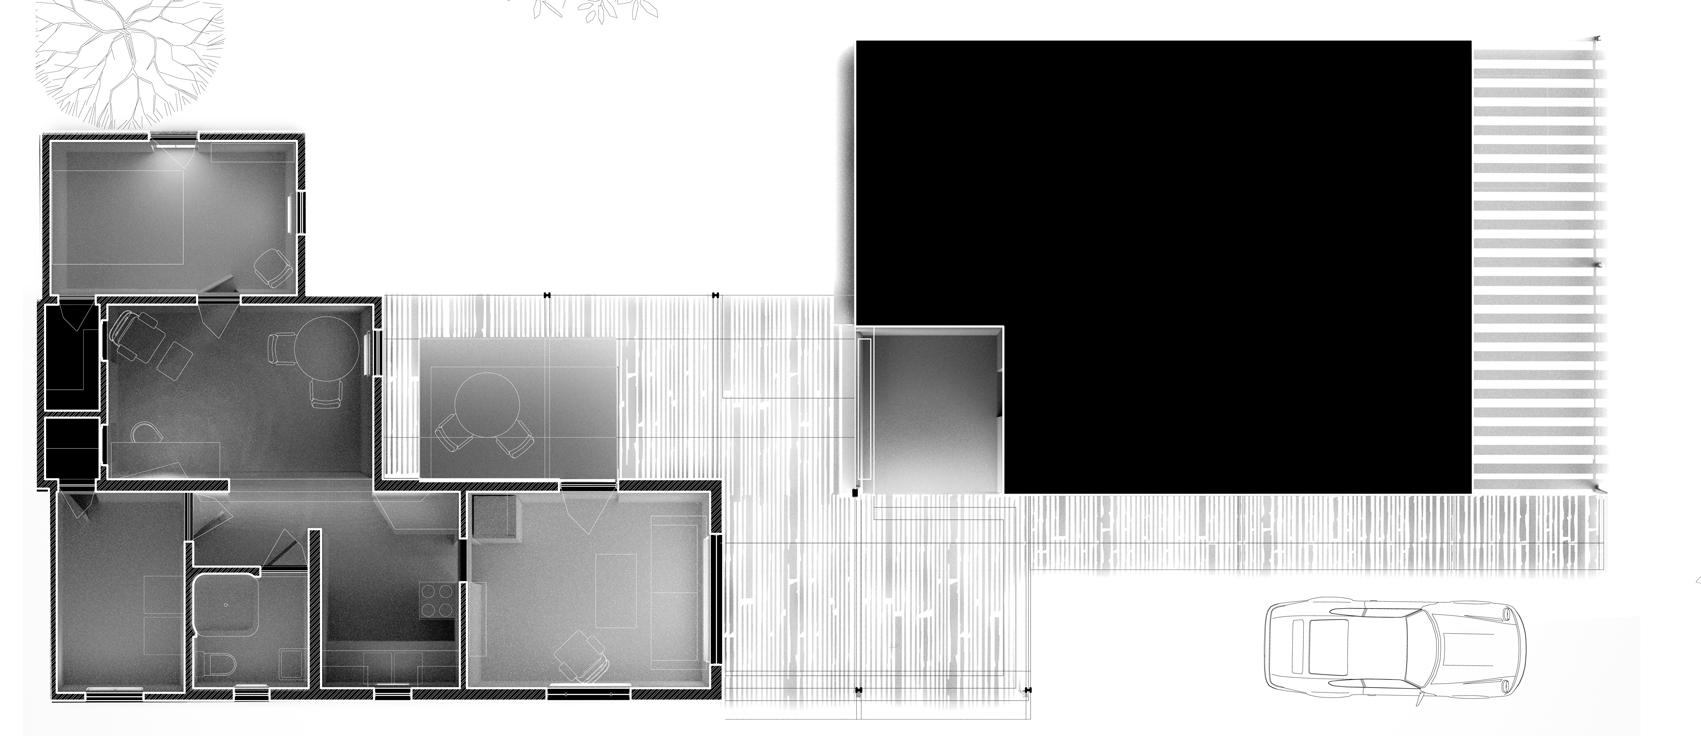 15_plan-2.jpg